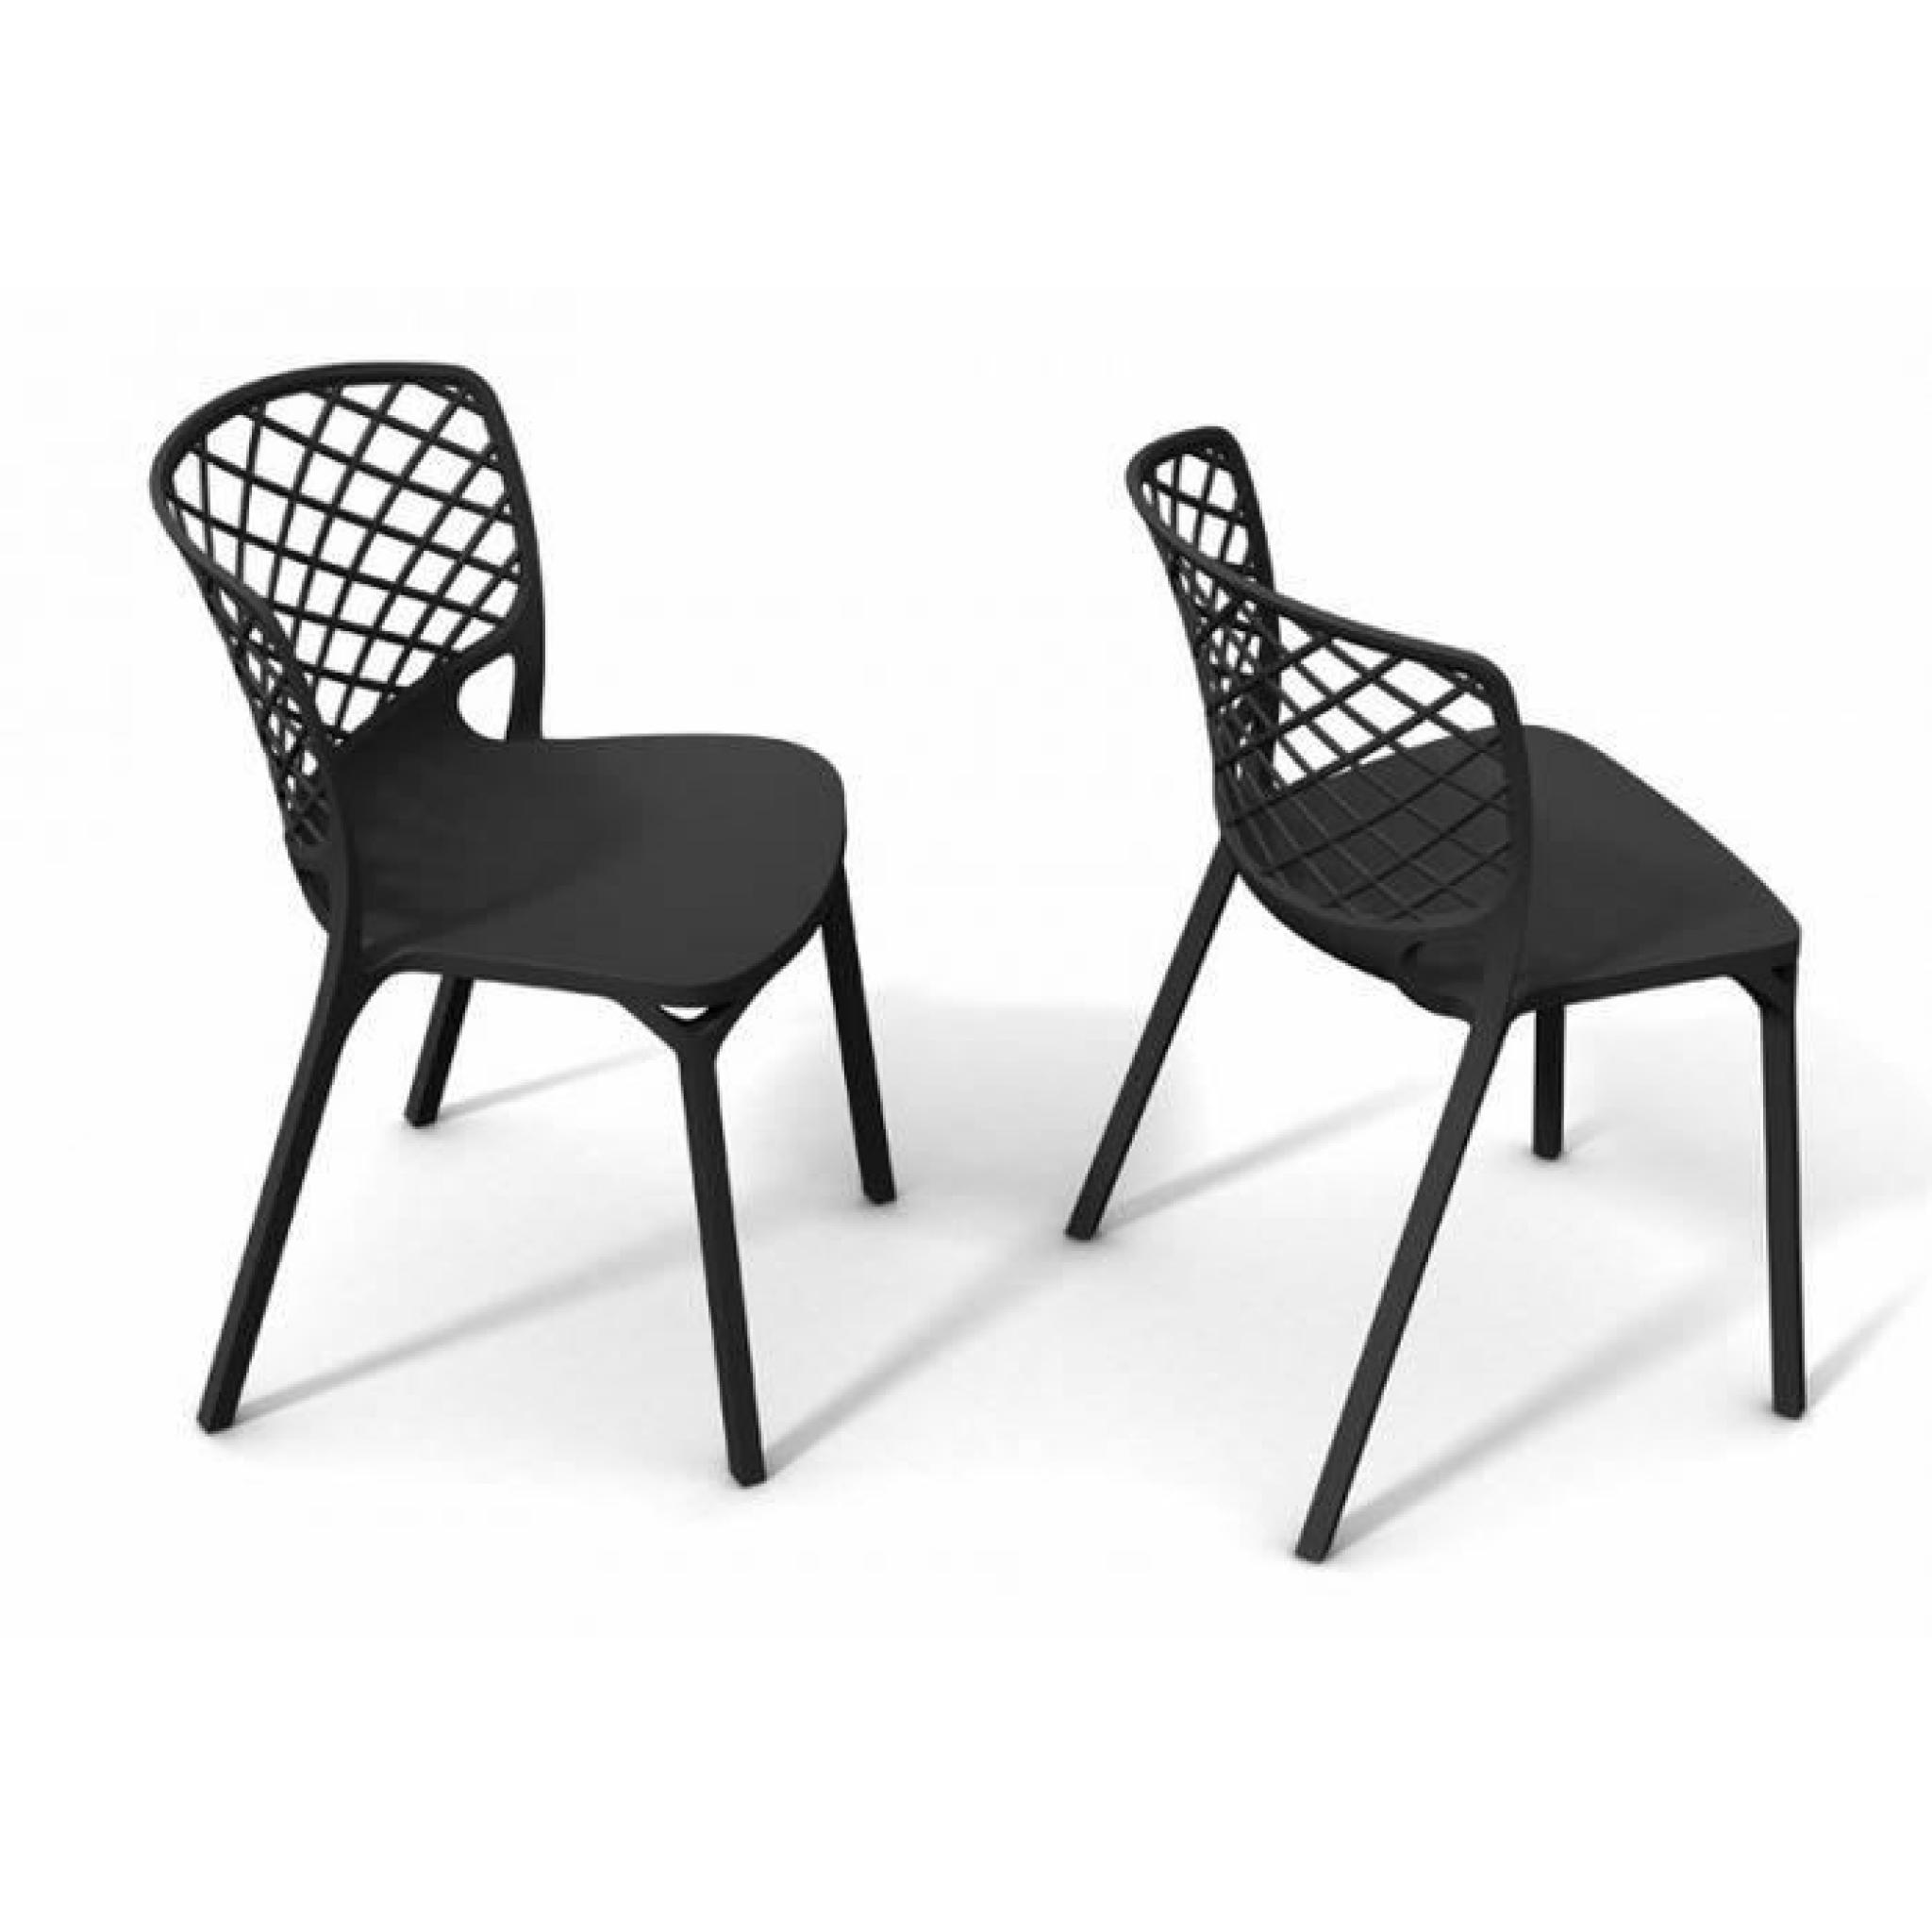 chaise empilable pas cher trendy chaise plastique. Black Bedroom Furniture Sets. Home Design Ideas